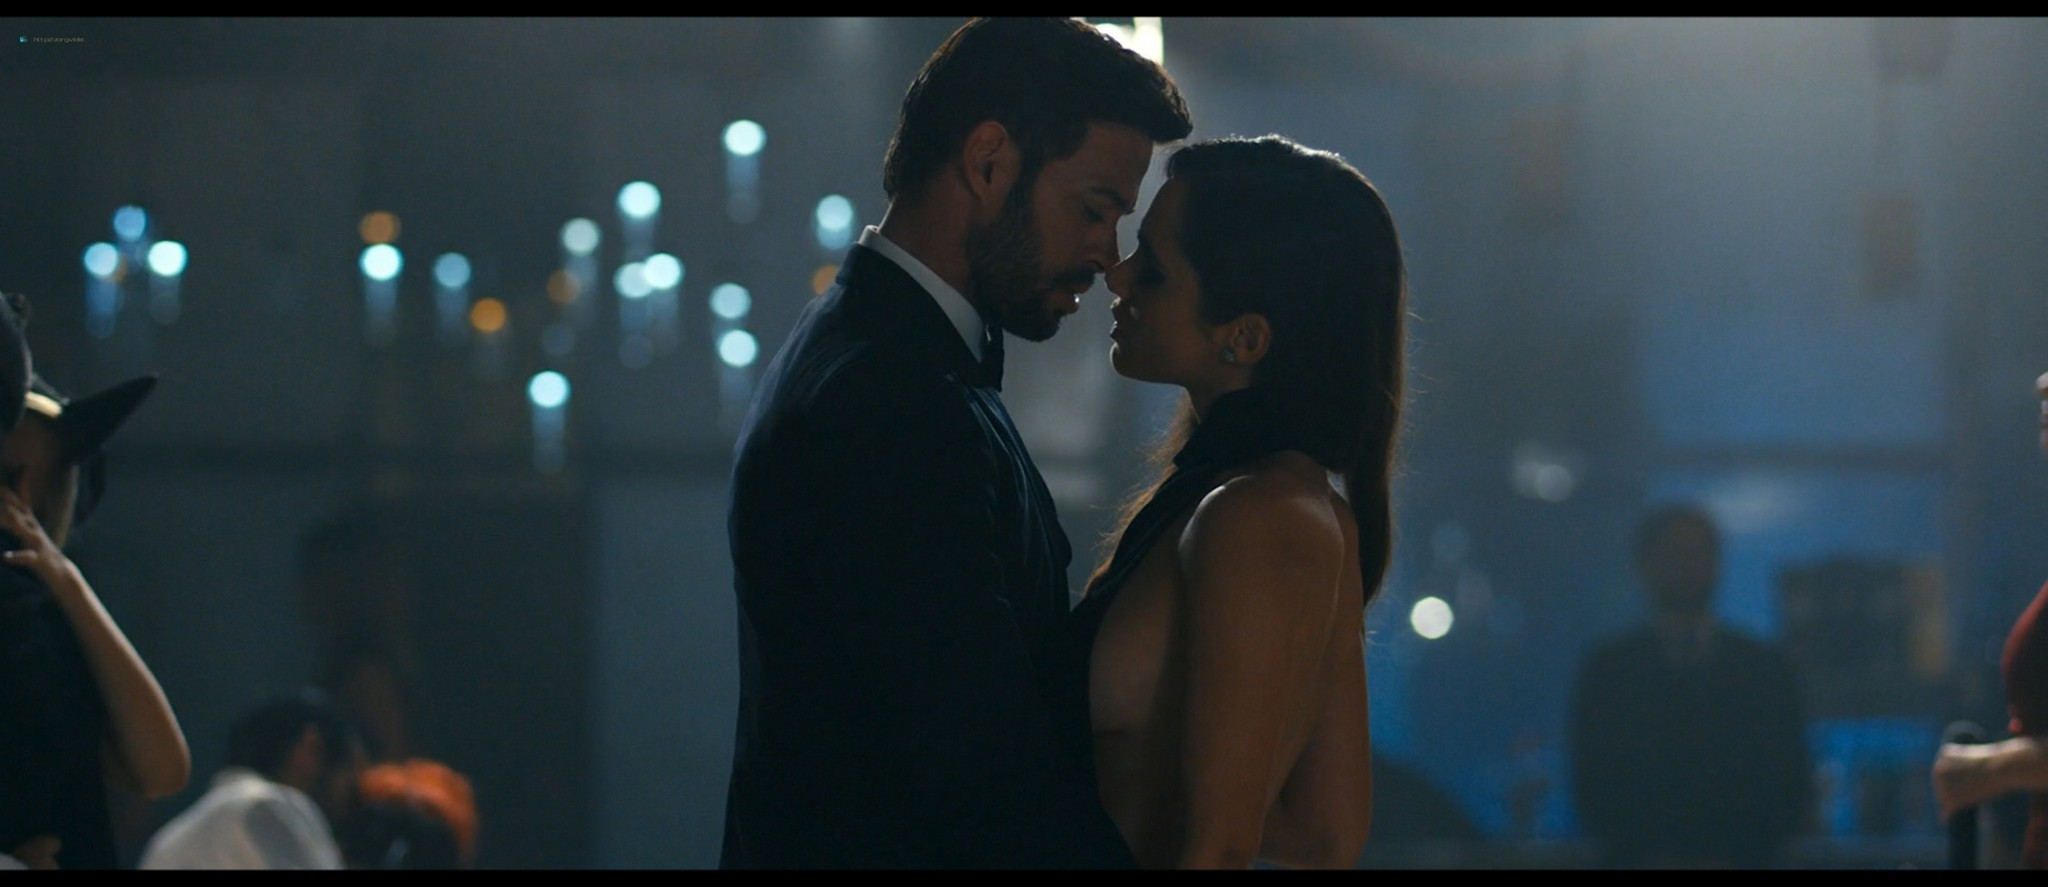 Alicia Sanz nude hot sex - En Brazos de un sesino (2019) HD 1080p Web (7)